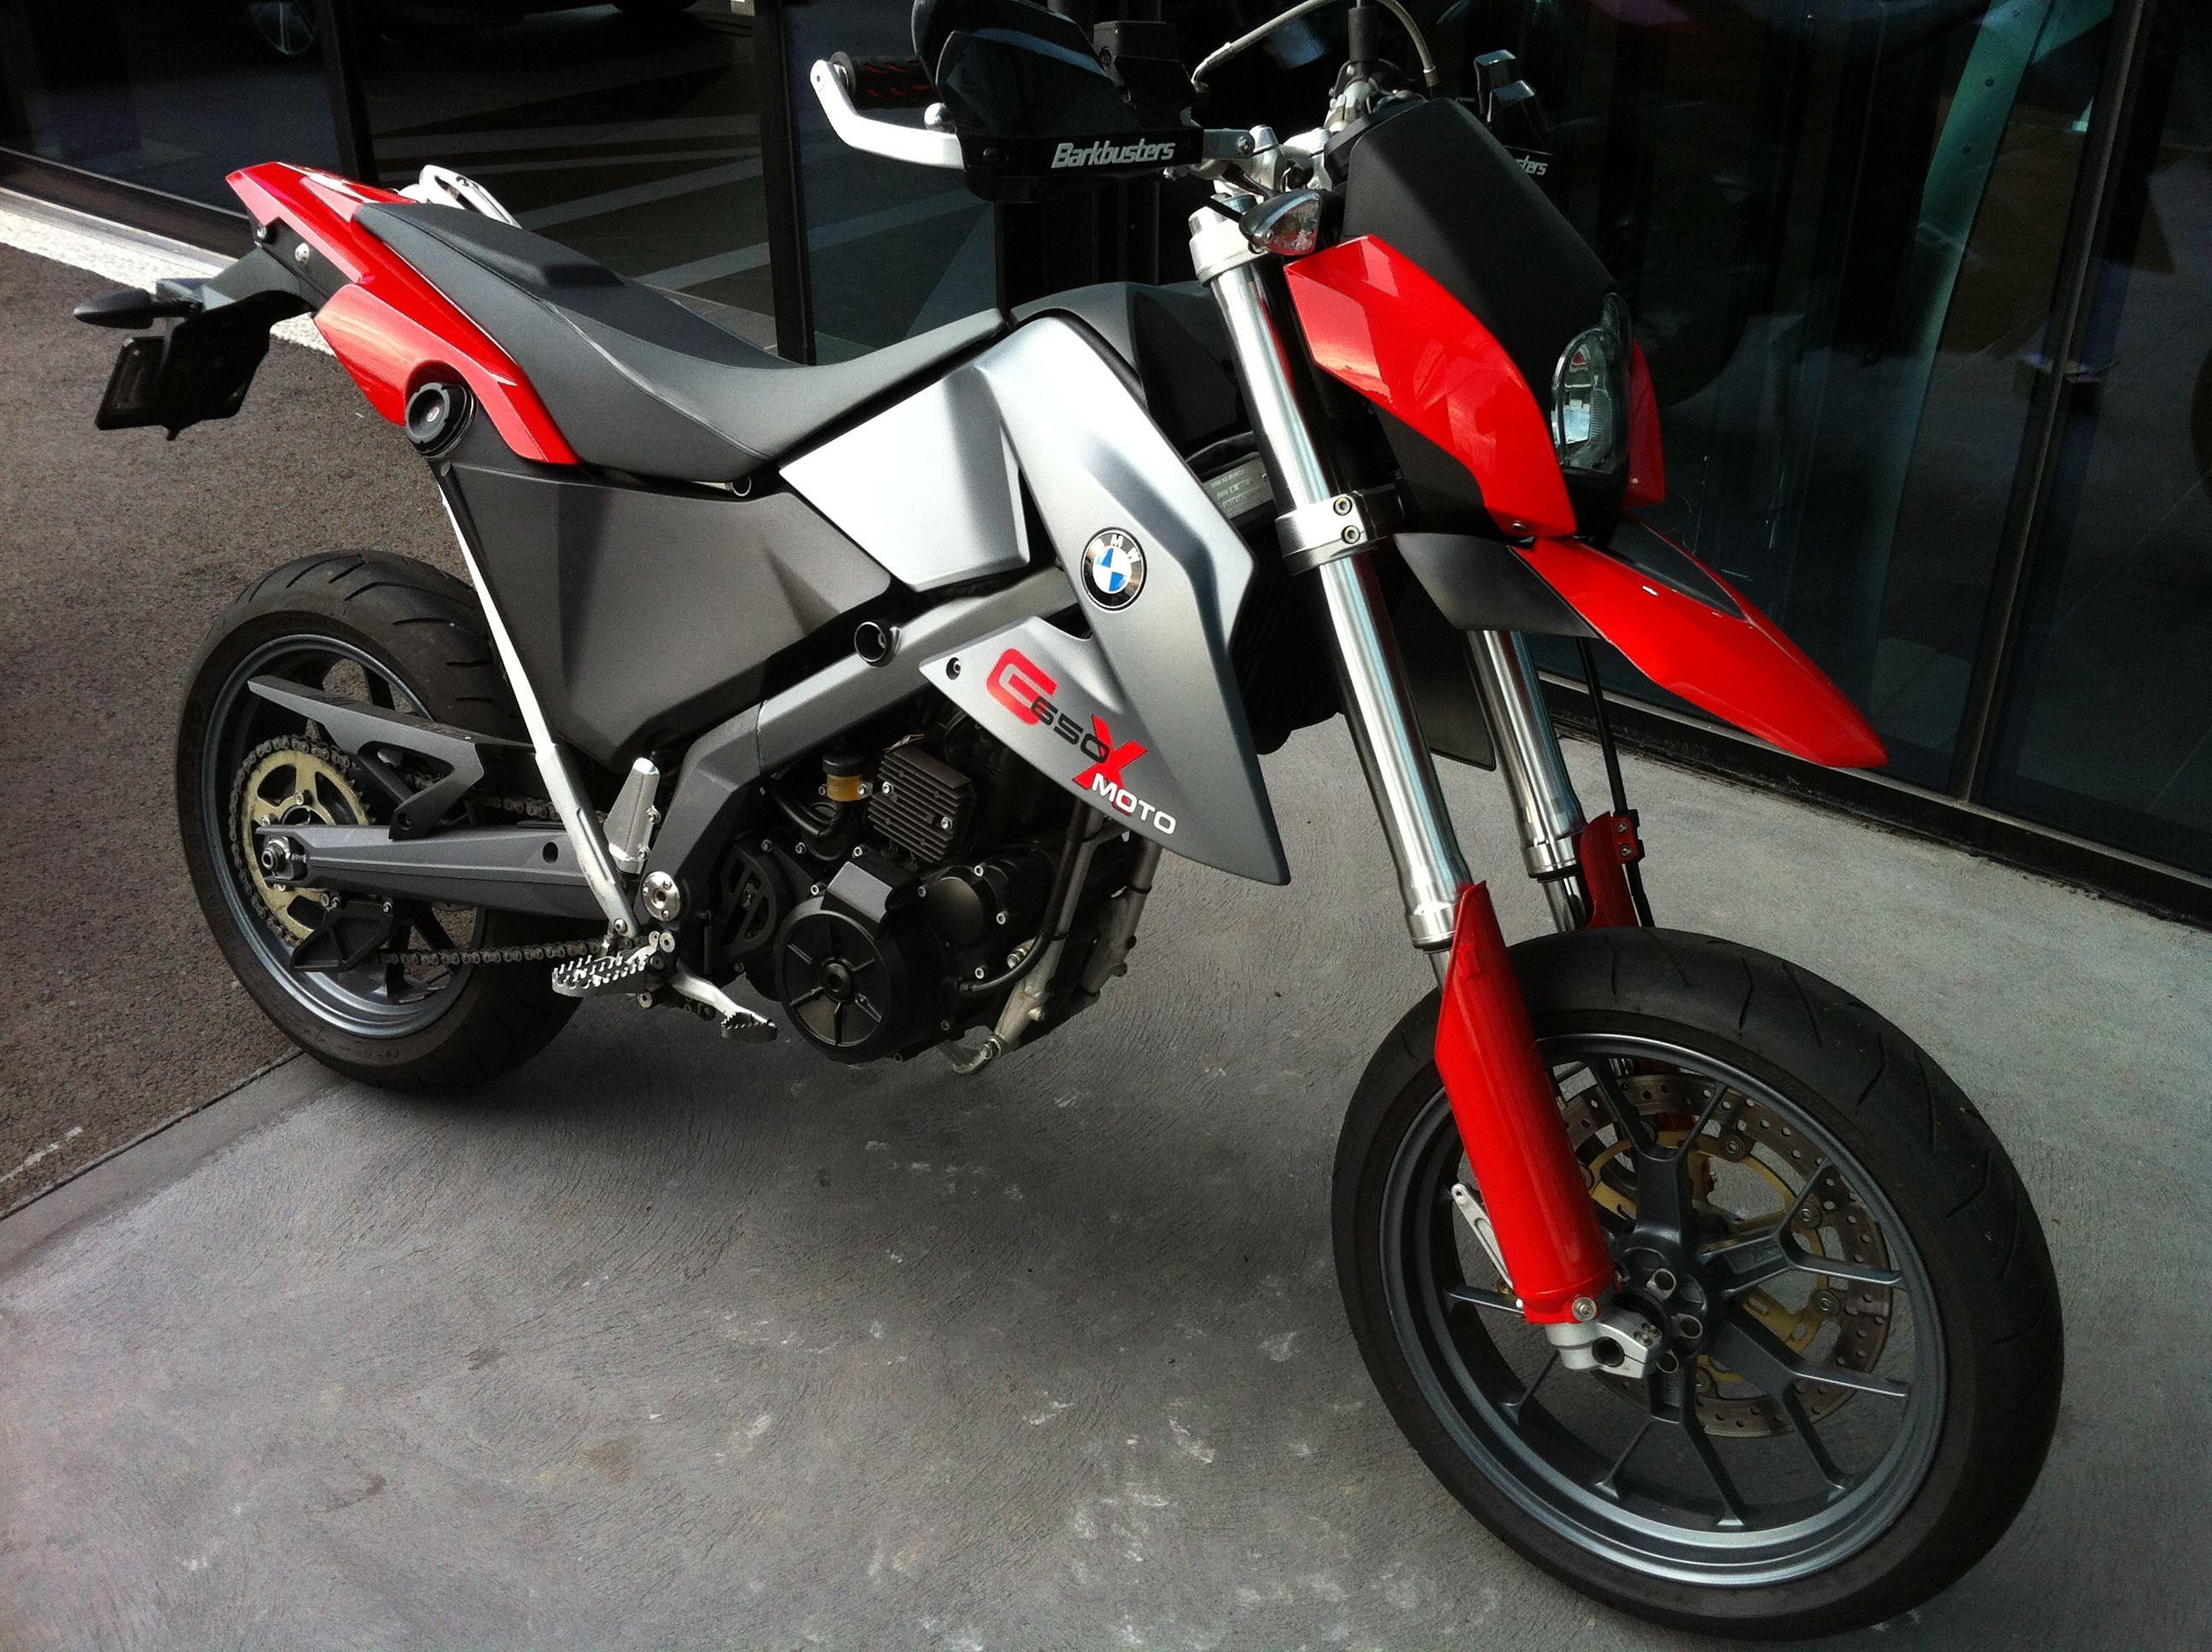 G650x Moto Vehicles Motorcycle Cars Motorcycles Dirt Bikes